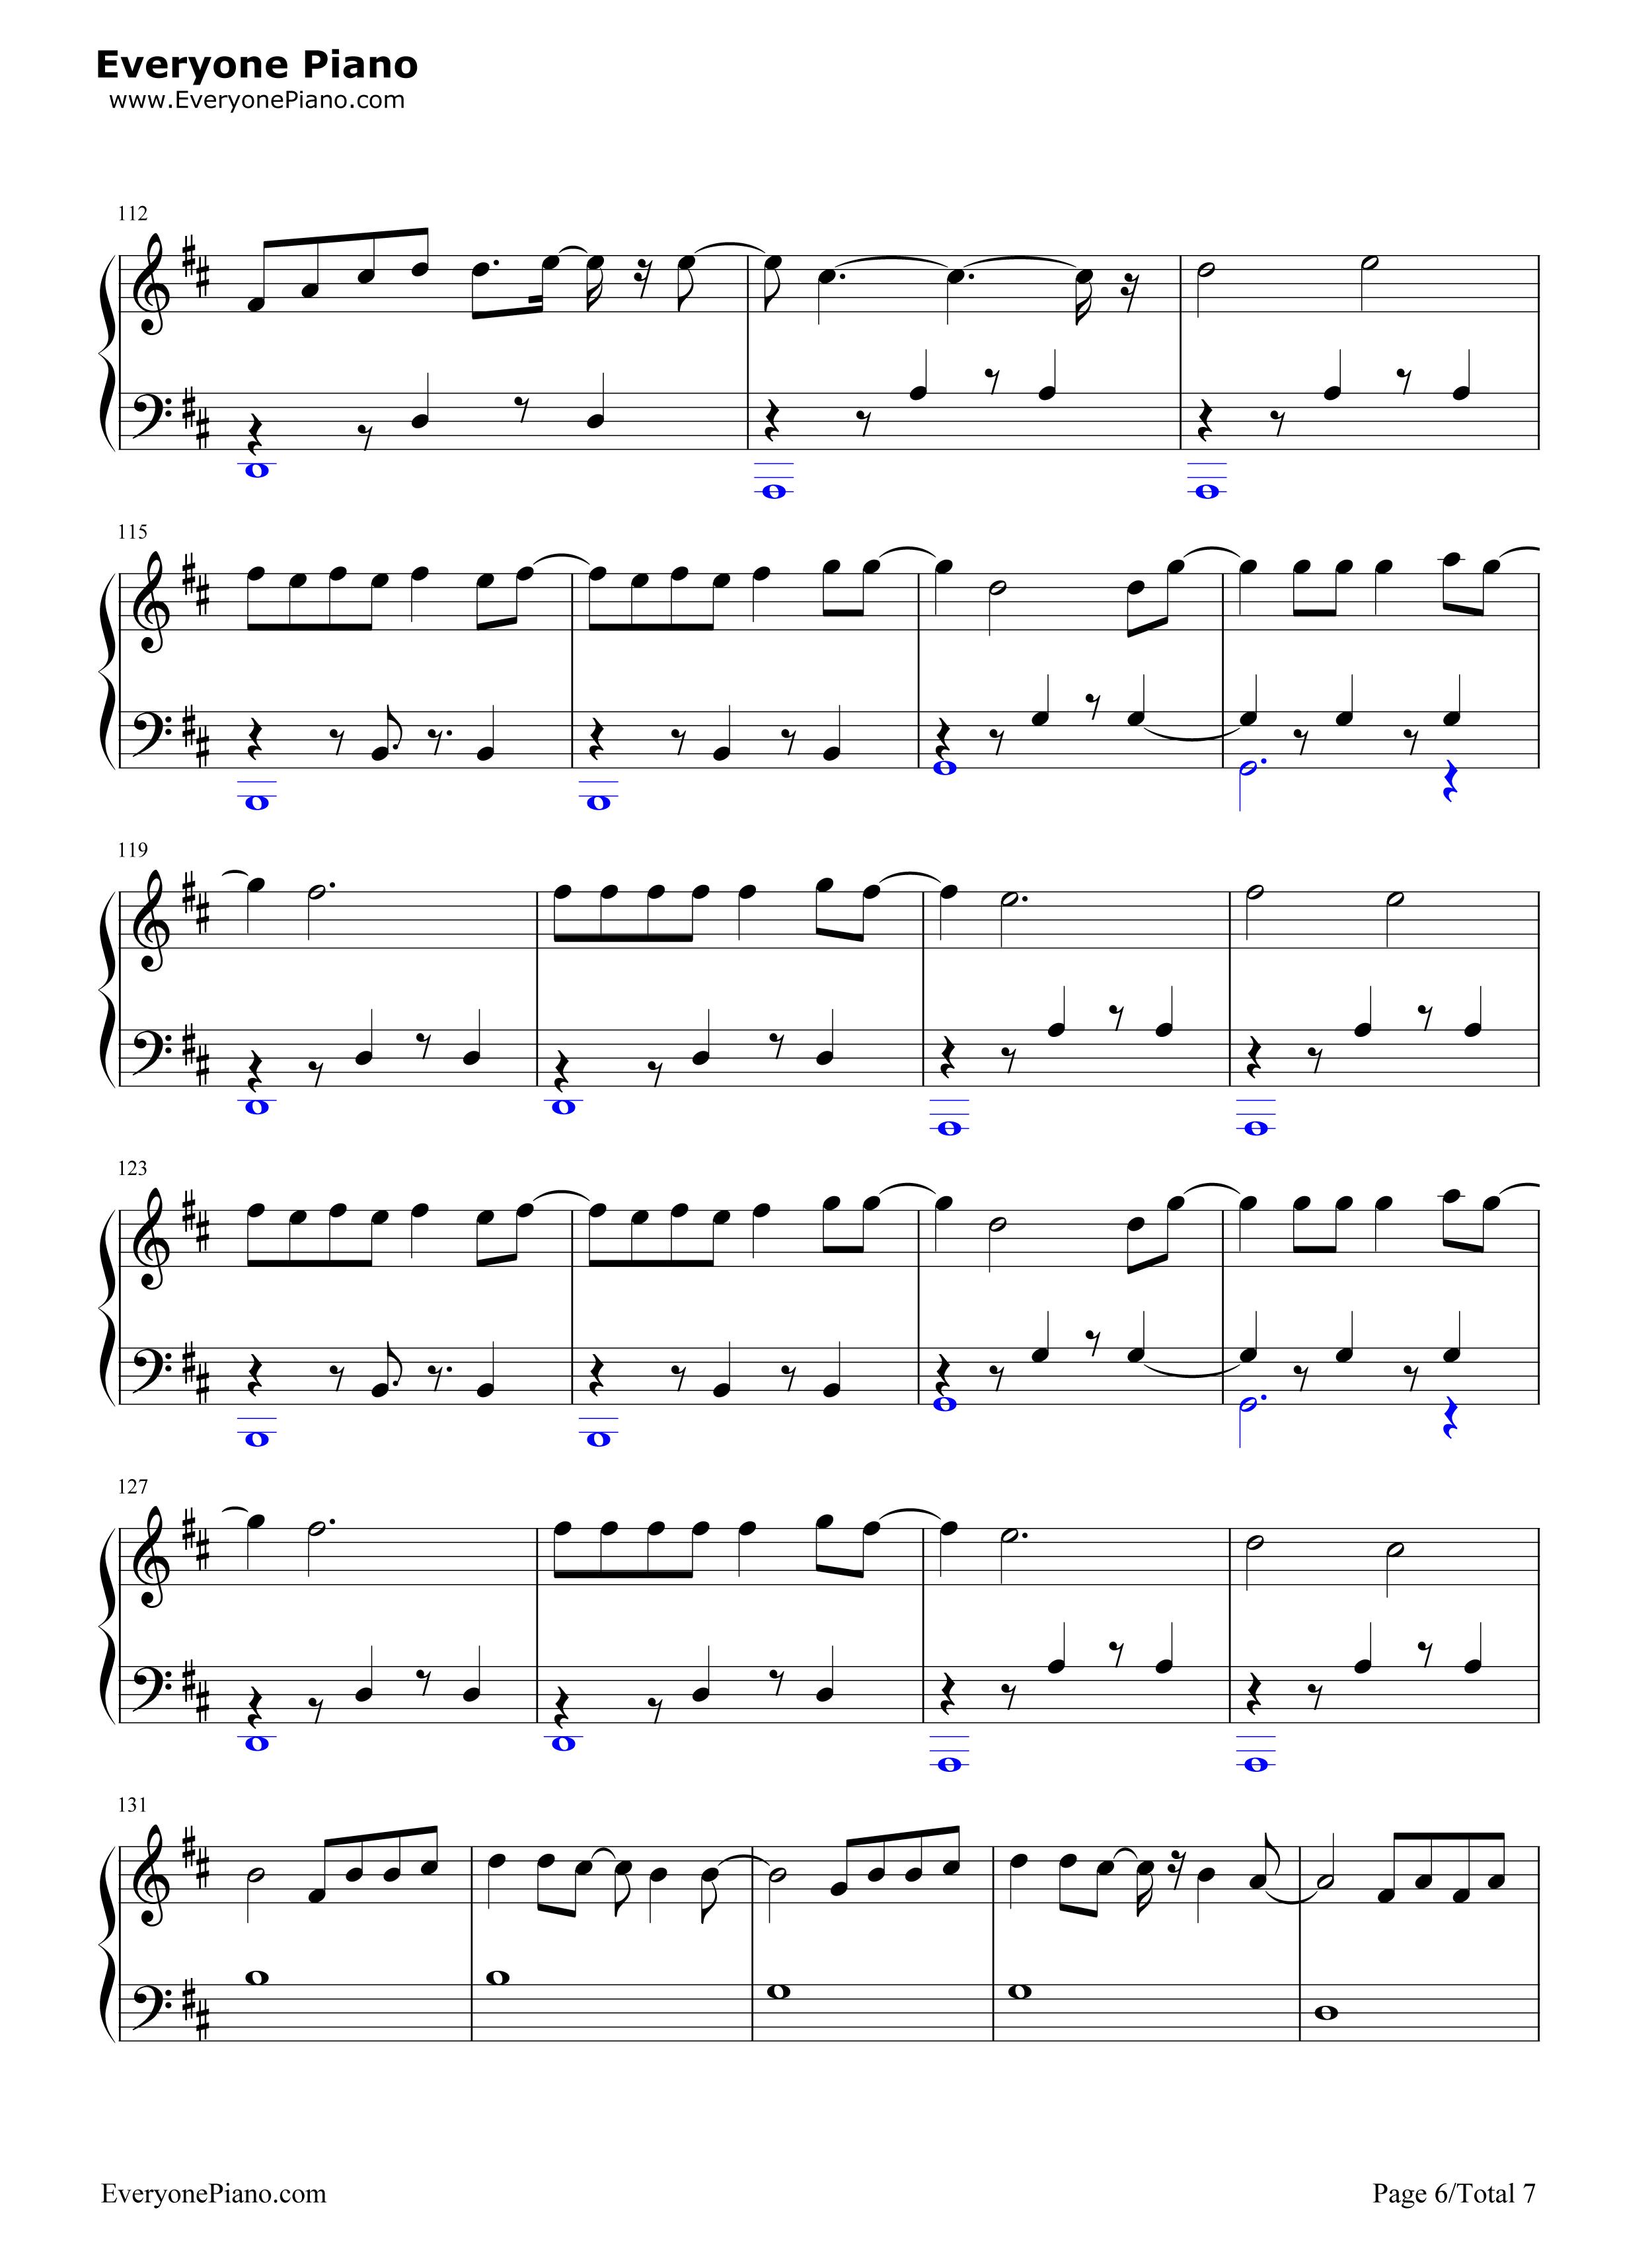 despacito简单版-luis fonsi五线谱预览6图片